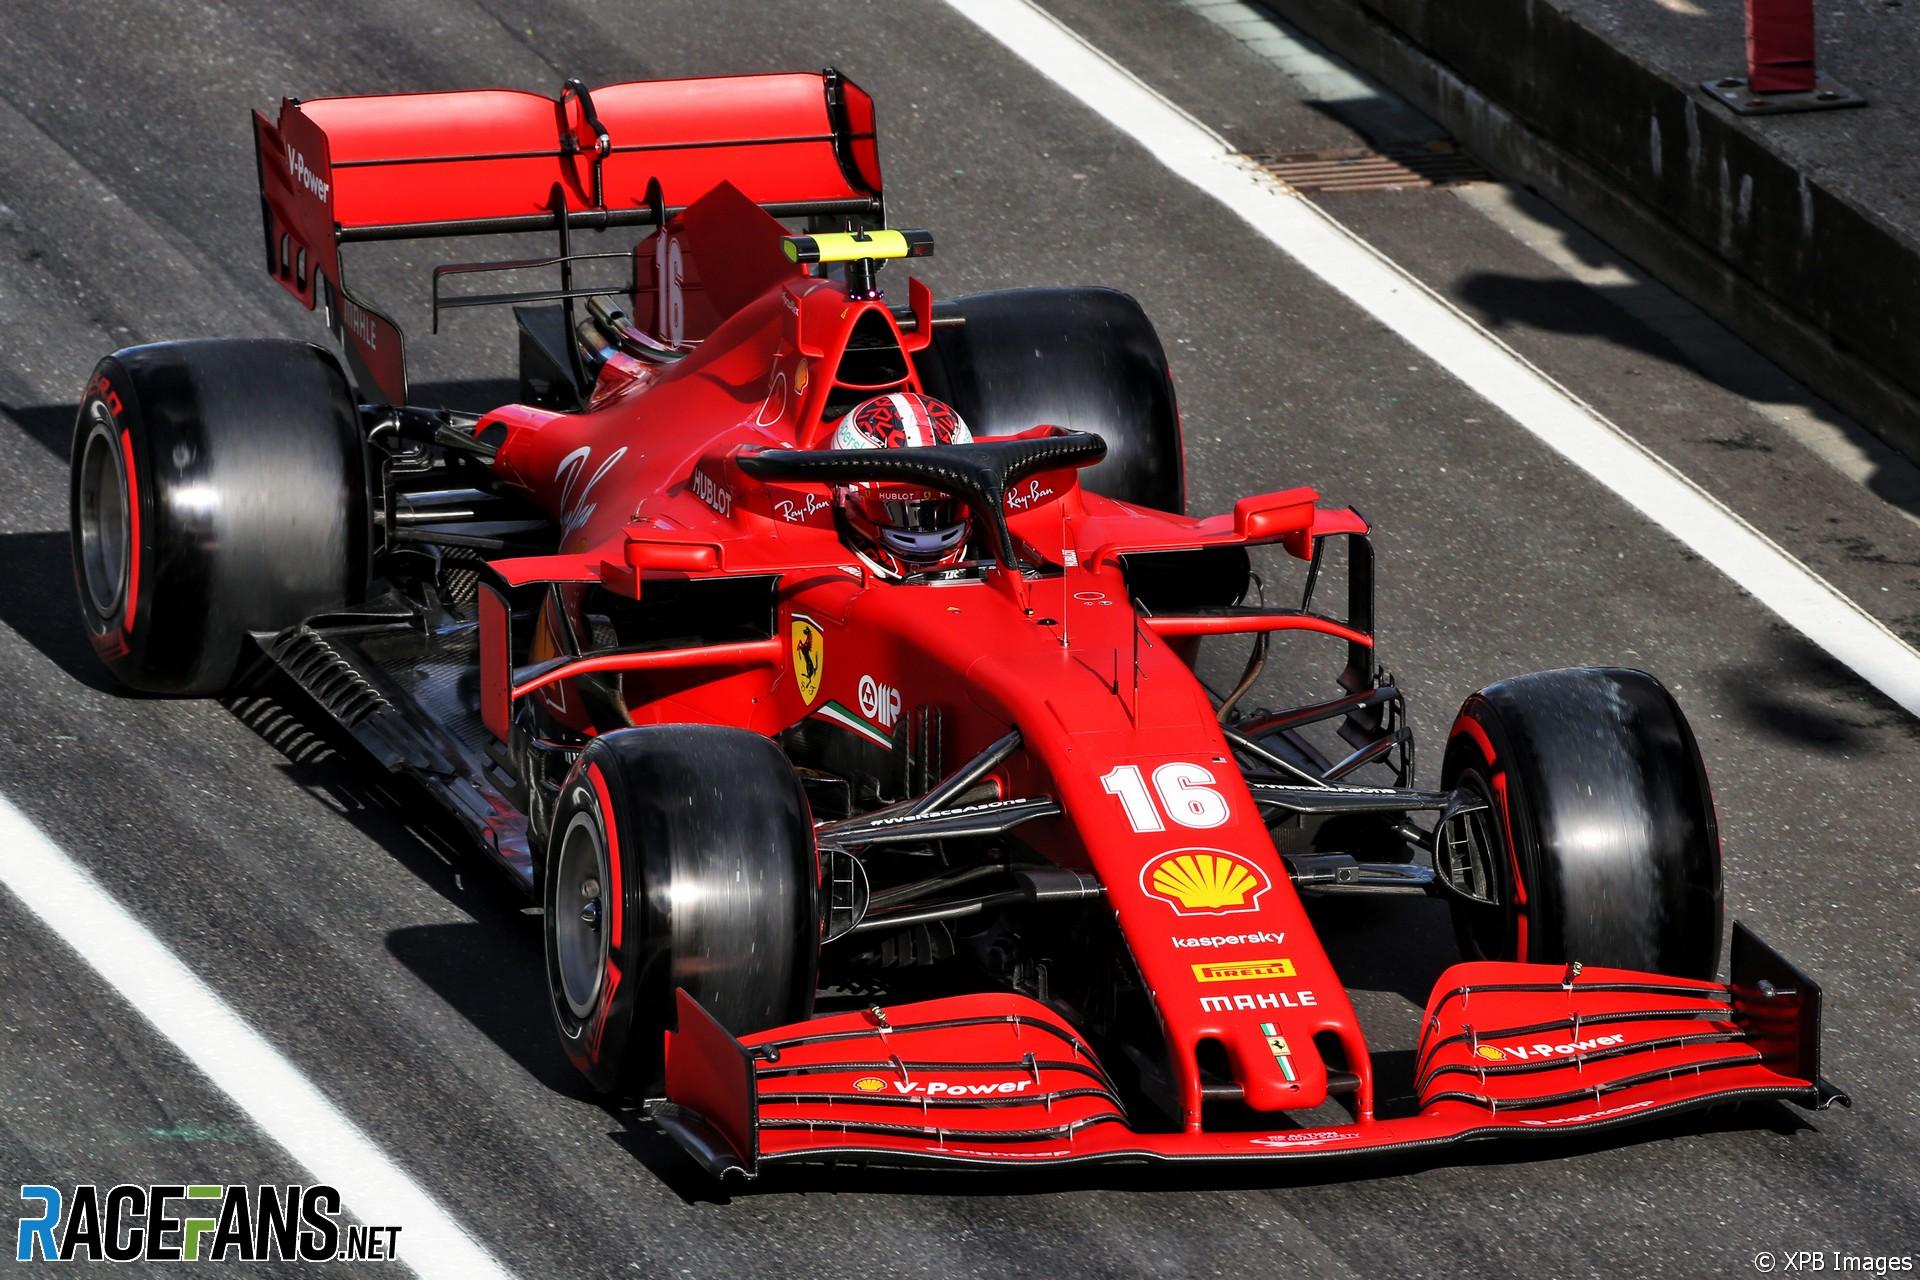 Charles Leclerc, Ferrari, Nurburgring, 2020